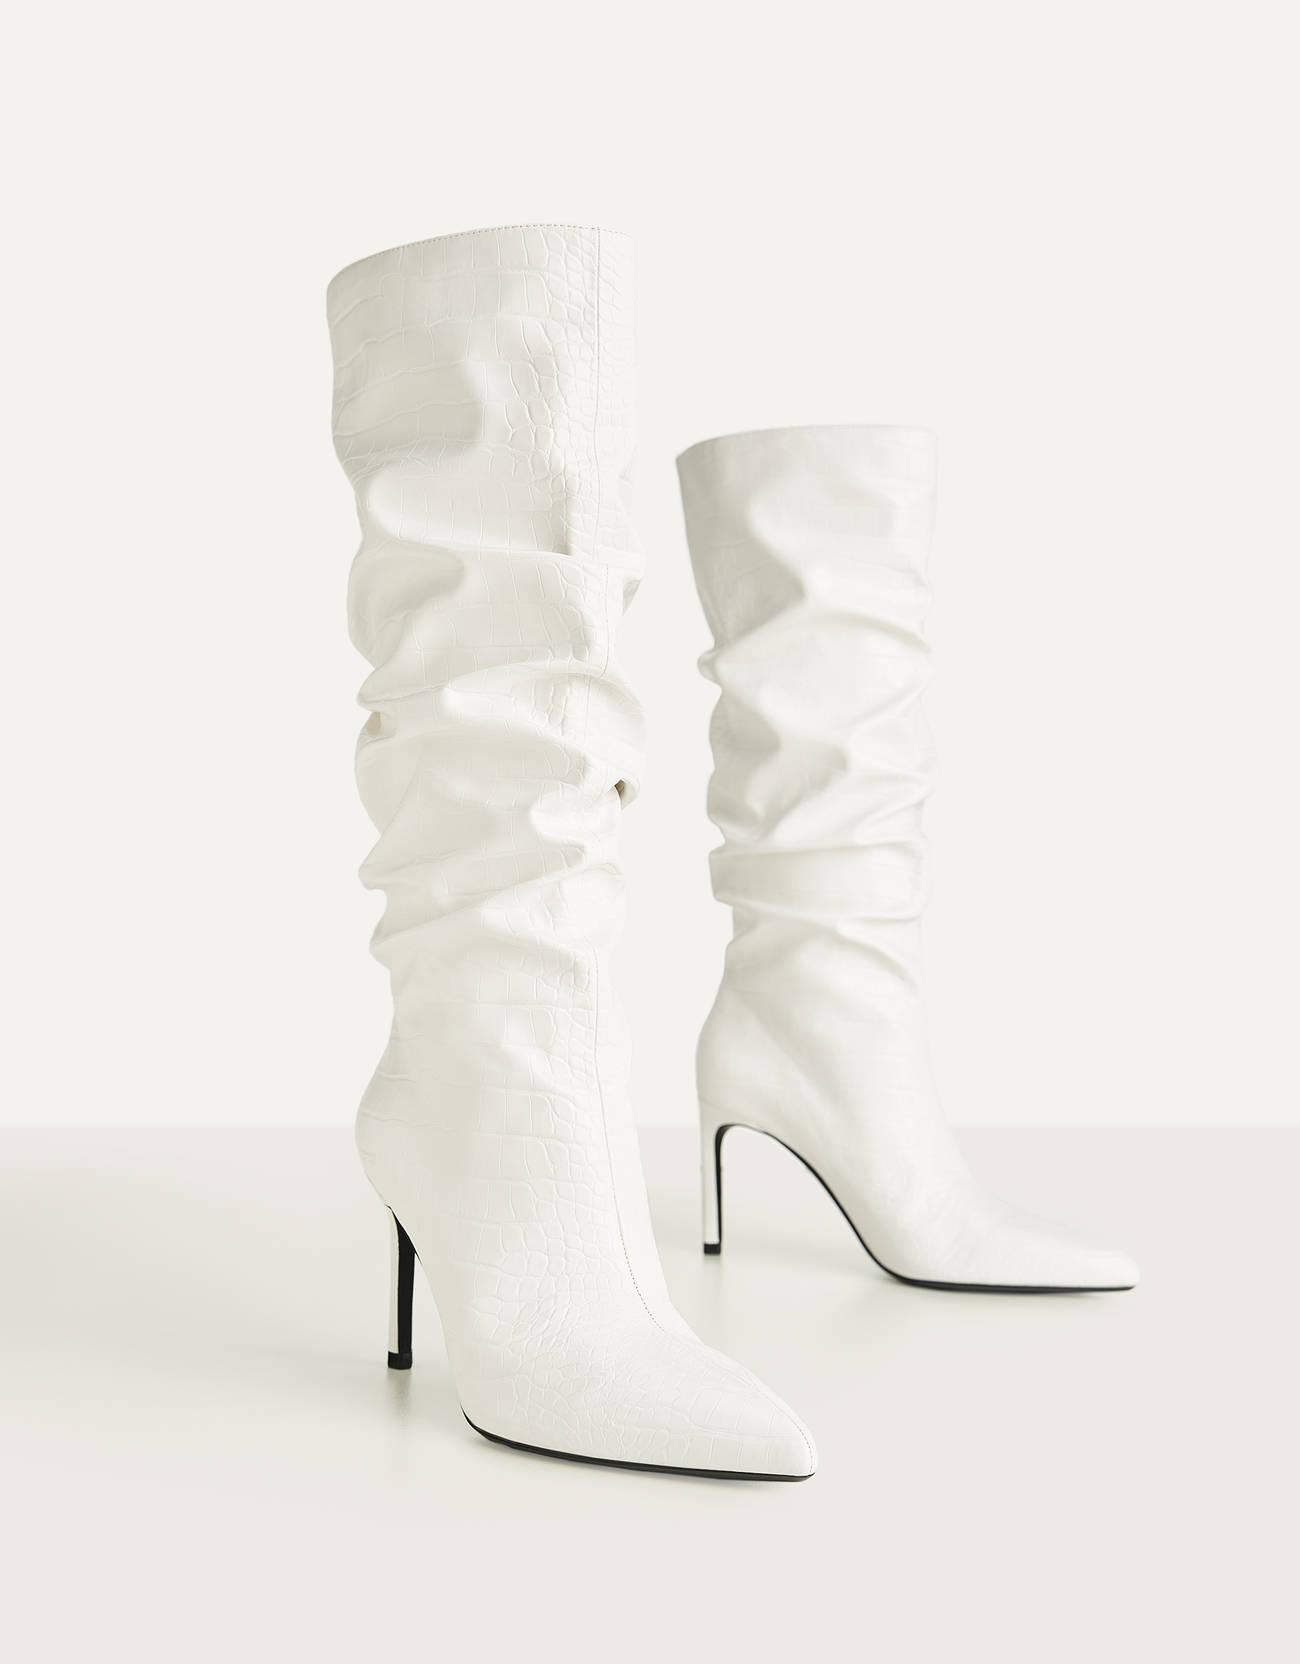 Botas blancas de caña arrugada